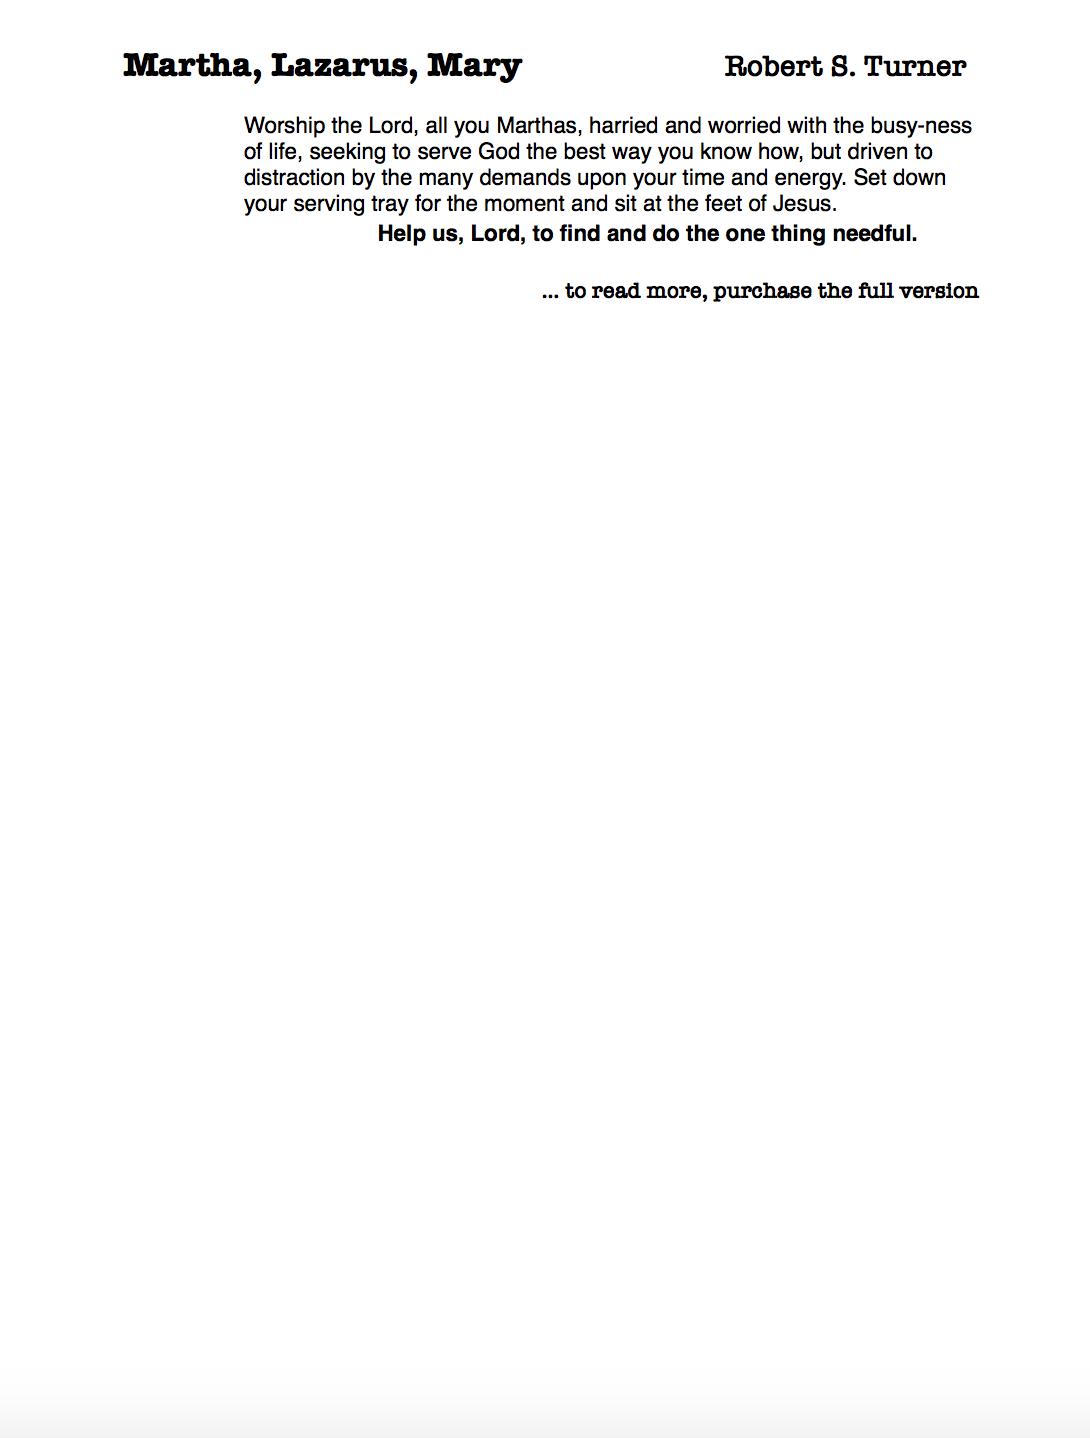 martha, lazarus, mary partial screenshot.png